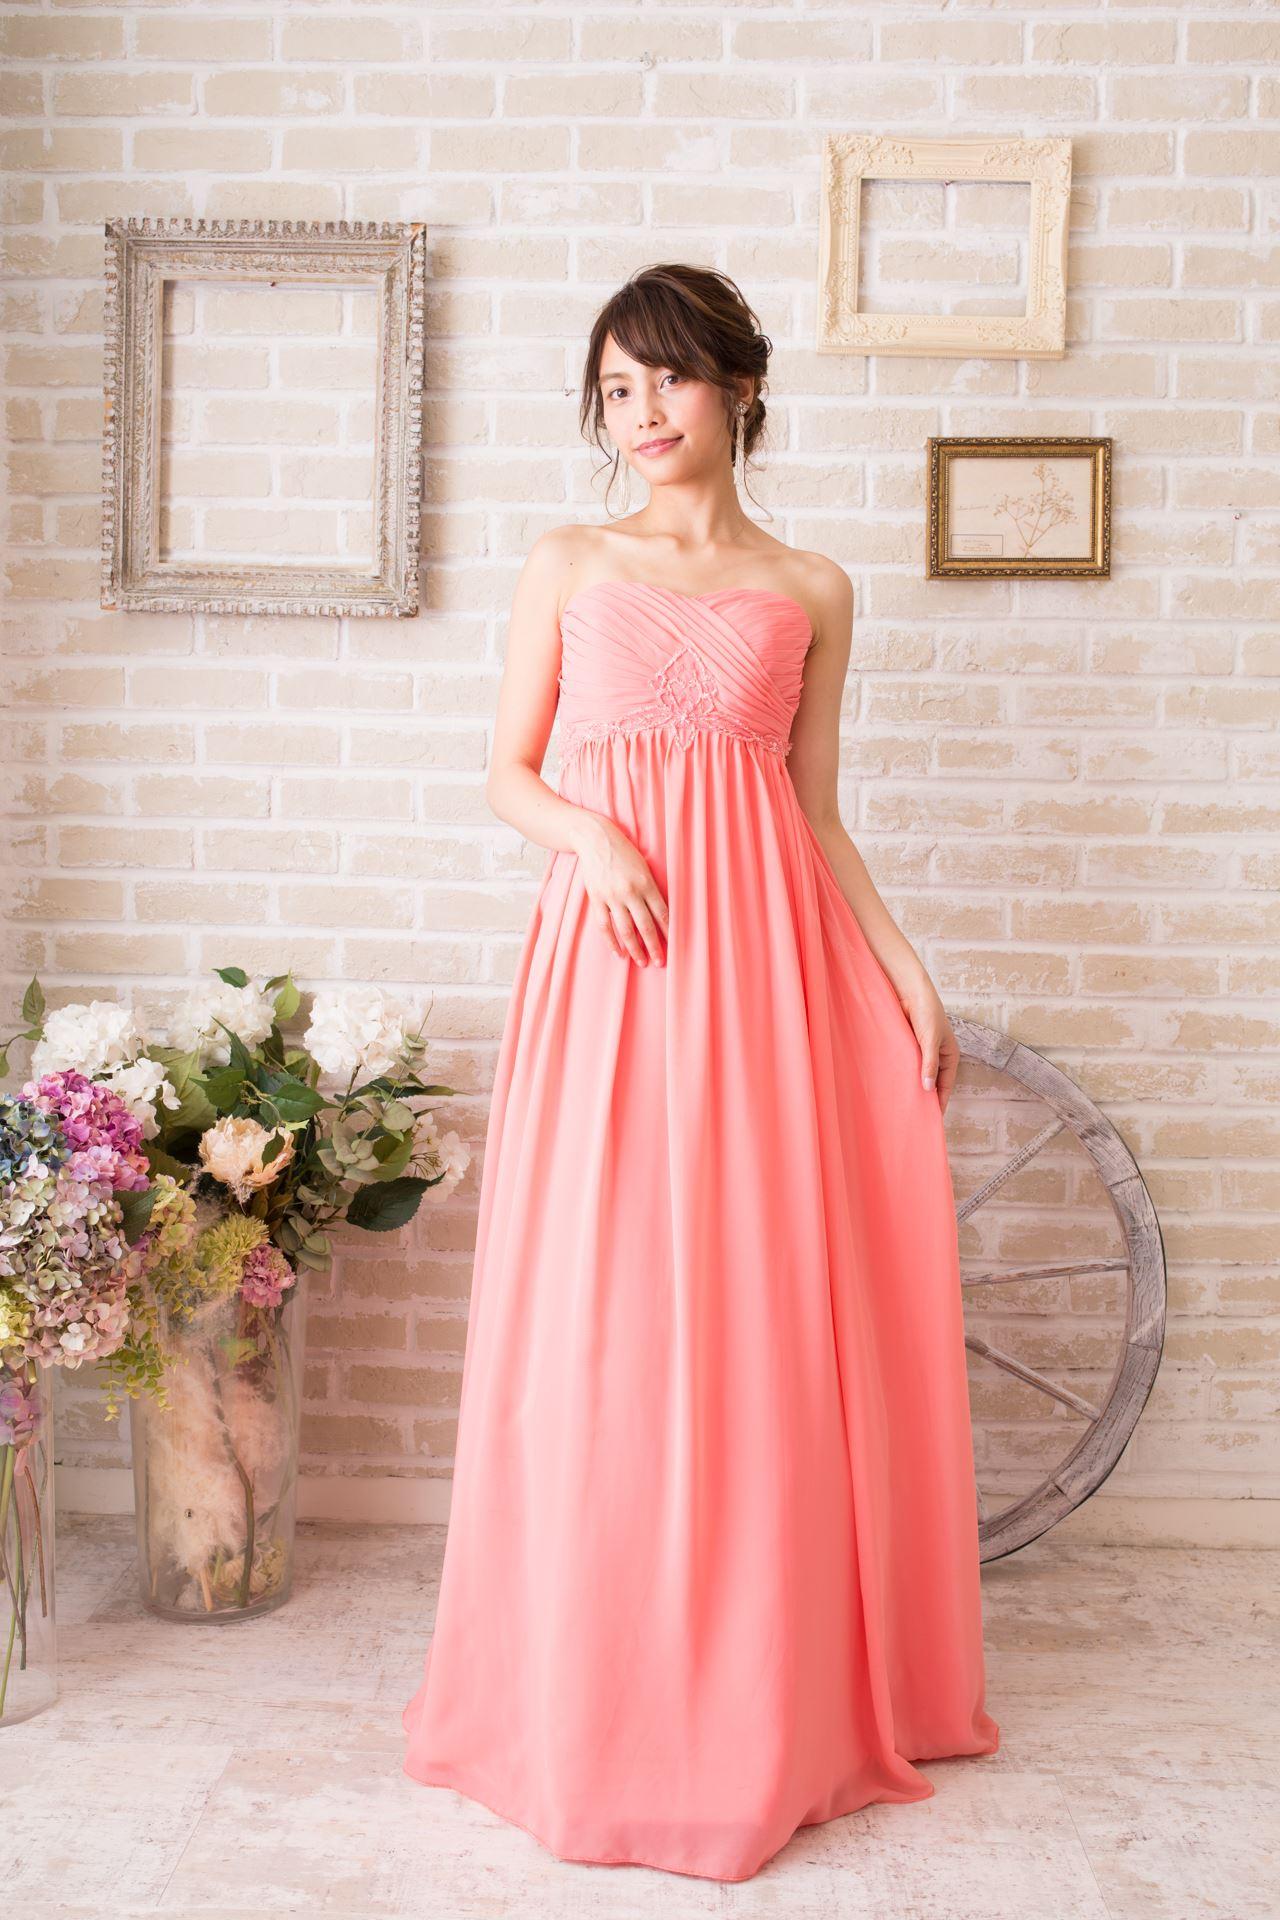 yk_nr_dress_444